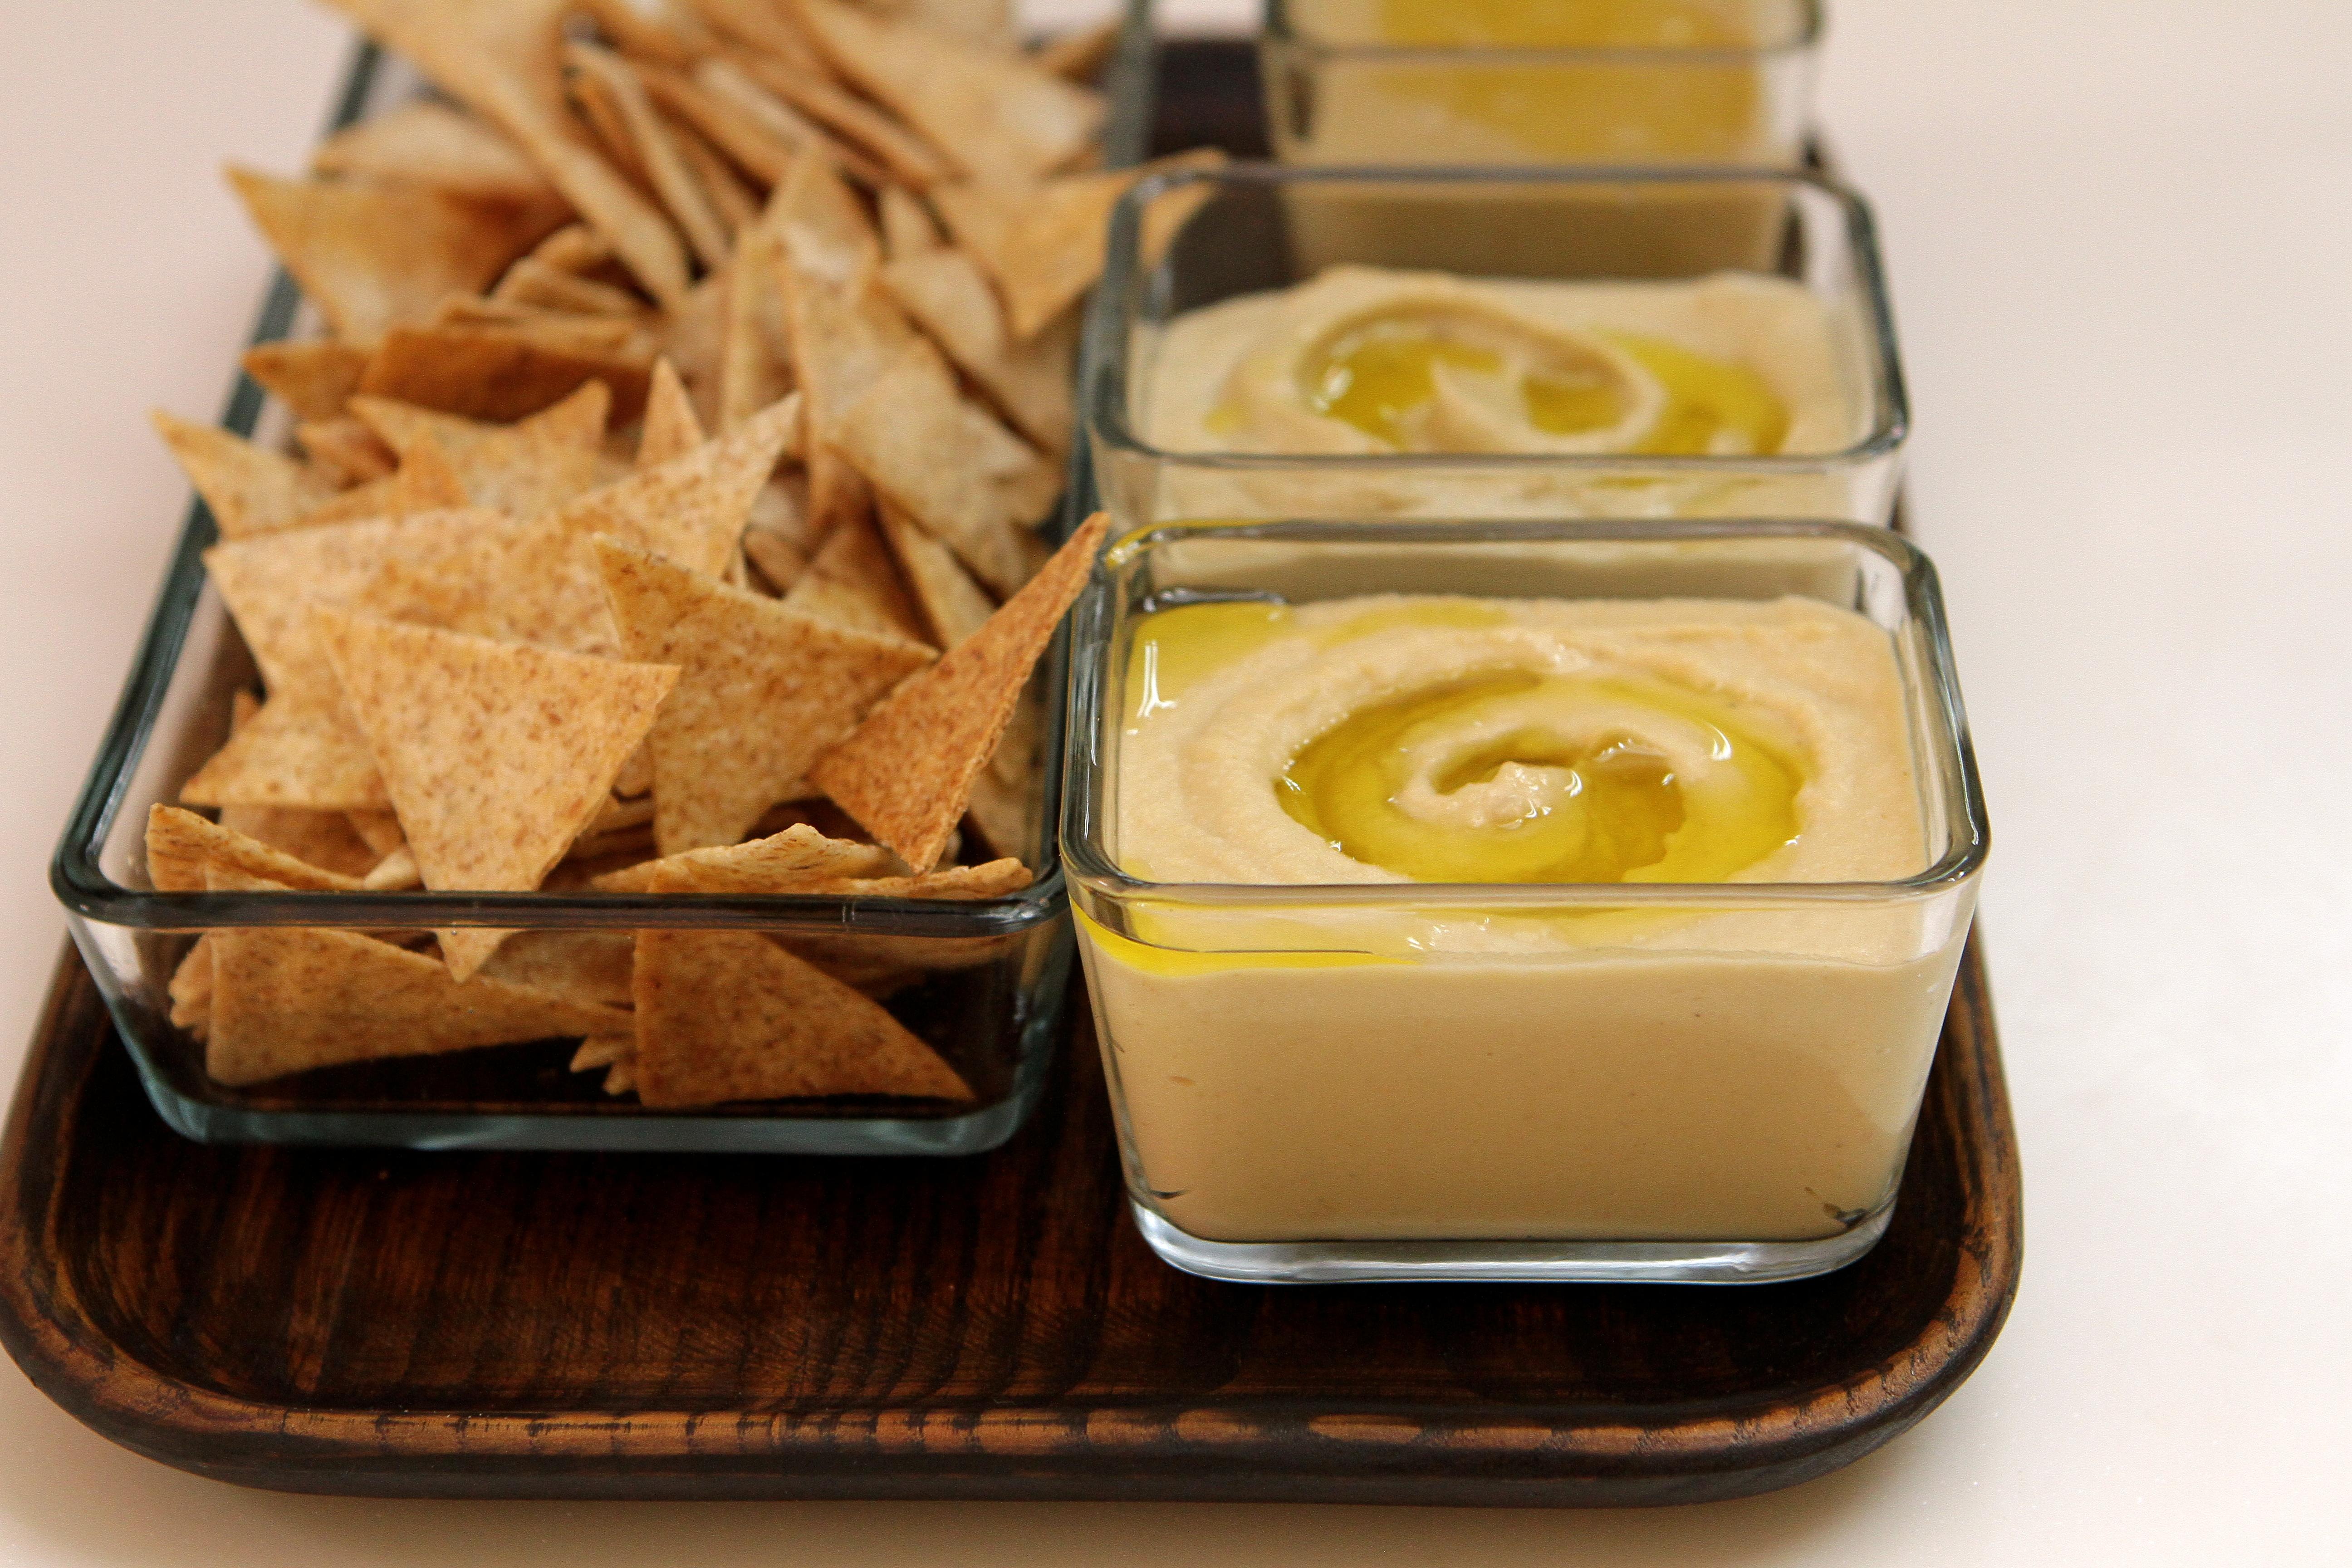 Hummus and Baba Ghanoush